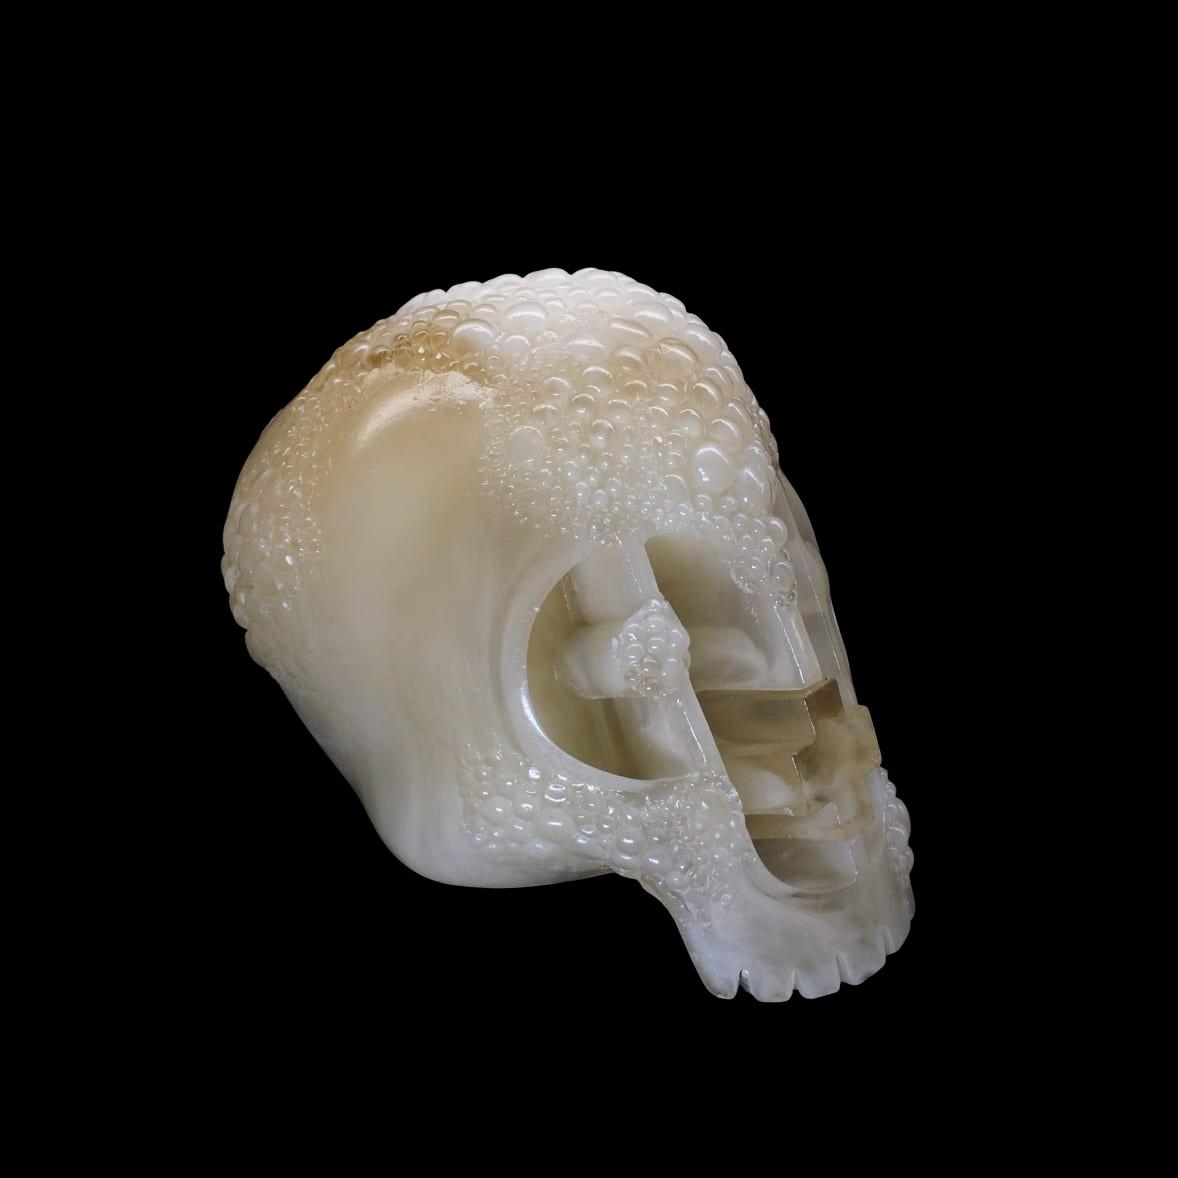 Dirty Ice Plague Skull